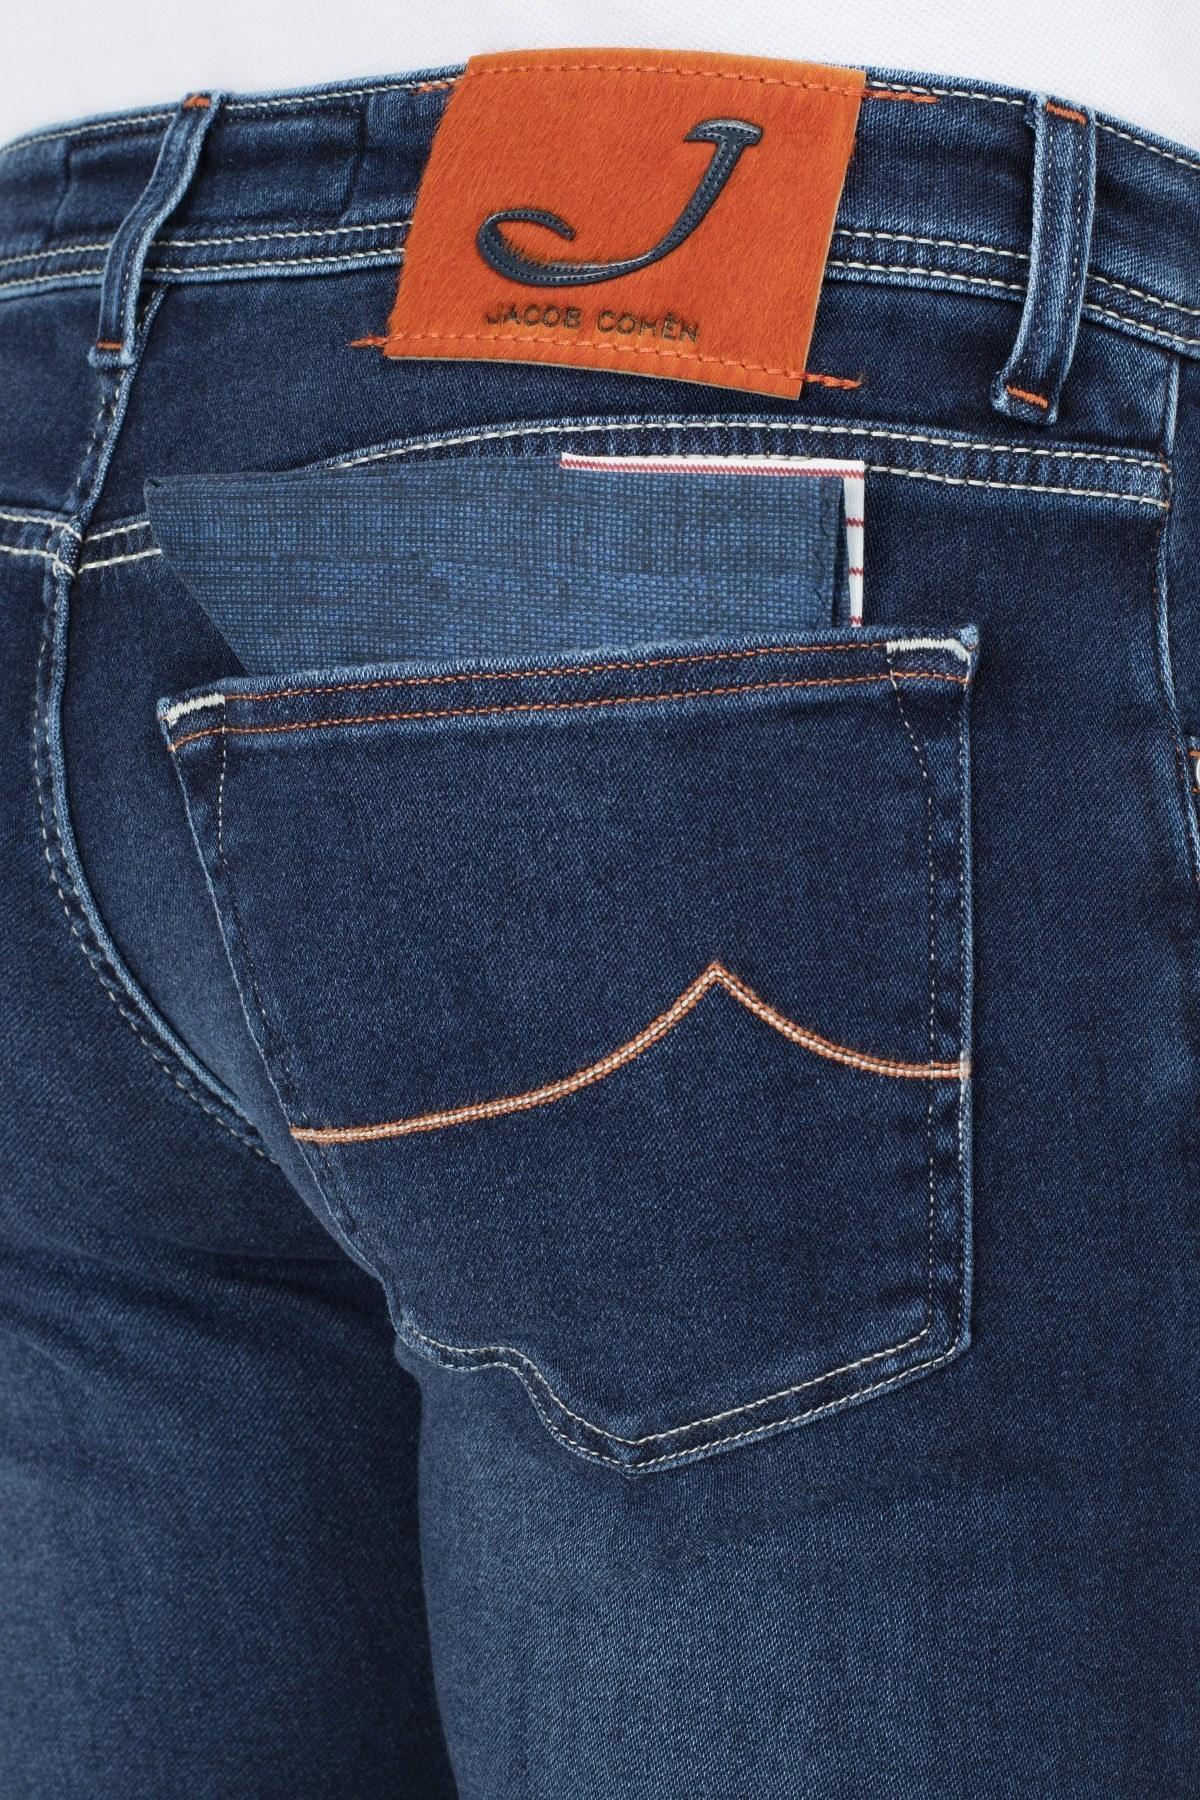 Jacob Cohen Jeans Erkek Kot Pantolon J622 973W2 002 LACİVERT